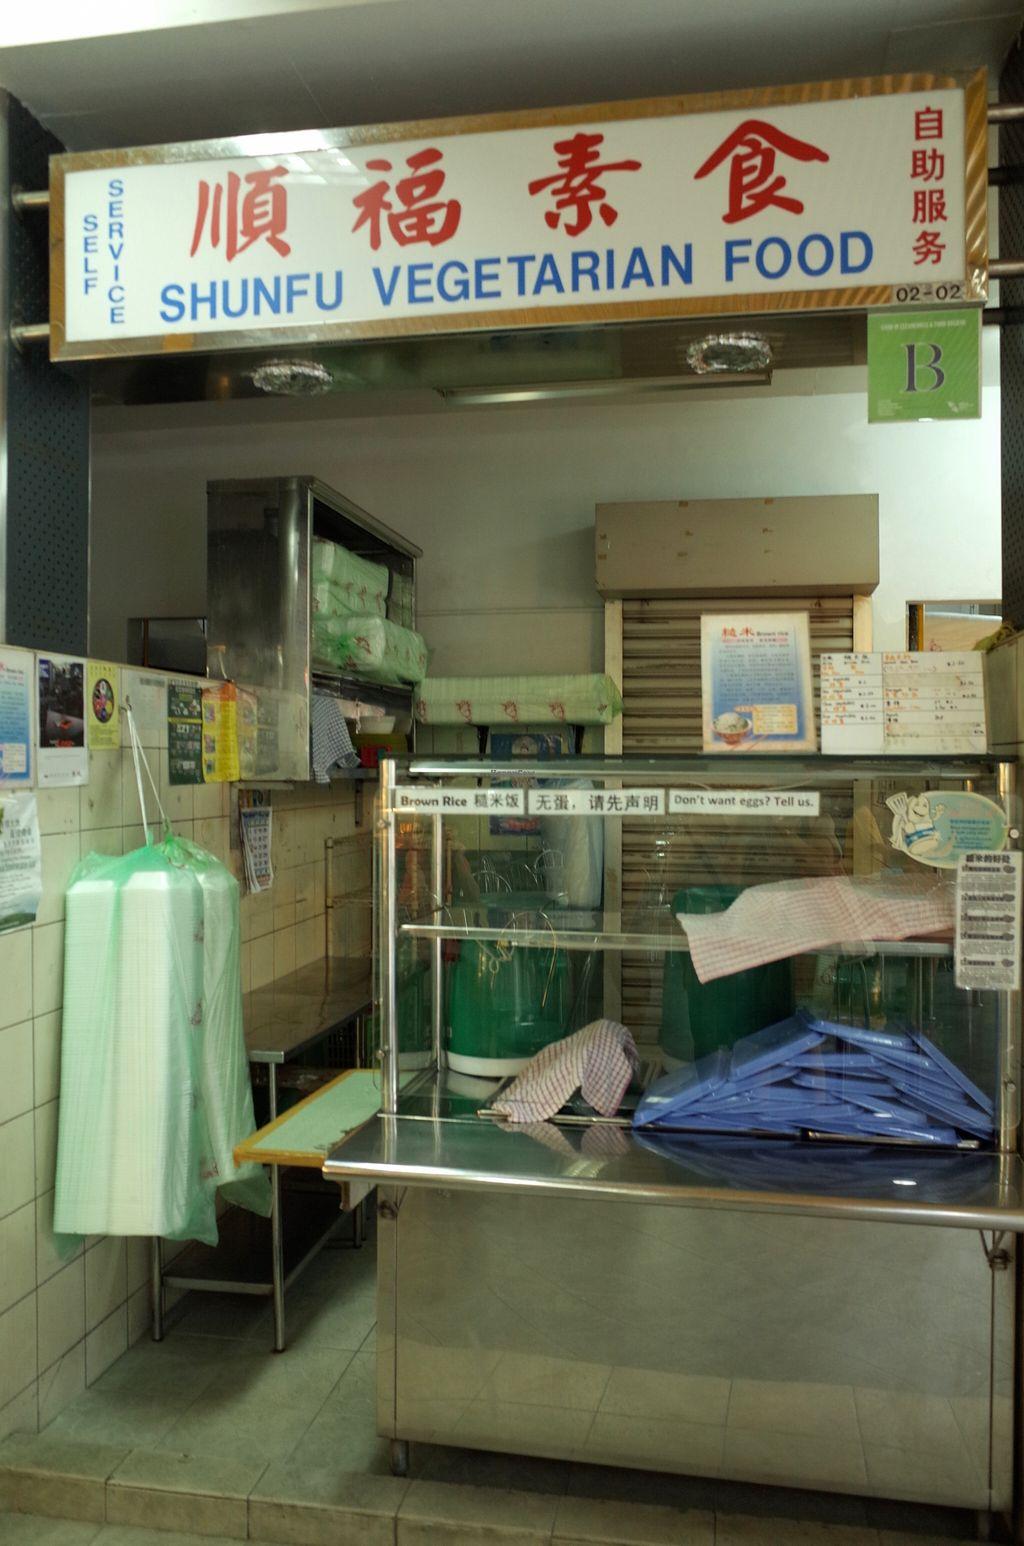 "Photo of Shunfu Vegetarian Stall  by <a href=""/members/profile/ouikouik"">ouikouik</a> <br/>shunfu vegetarian <br/> October 3, 2015  - <a href='/contact/abuse/image/64149/120094'>Report</a>"